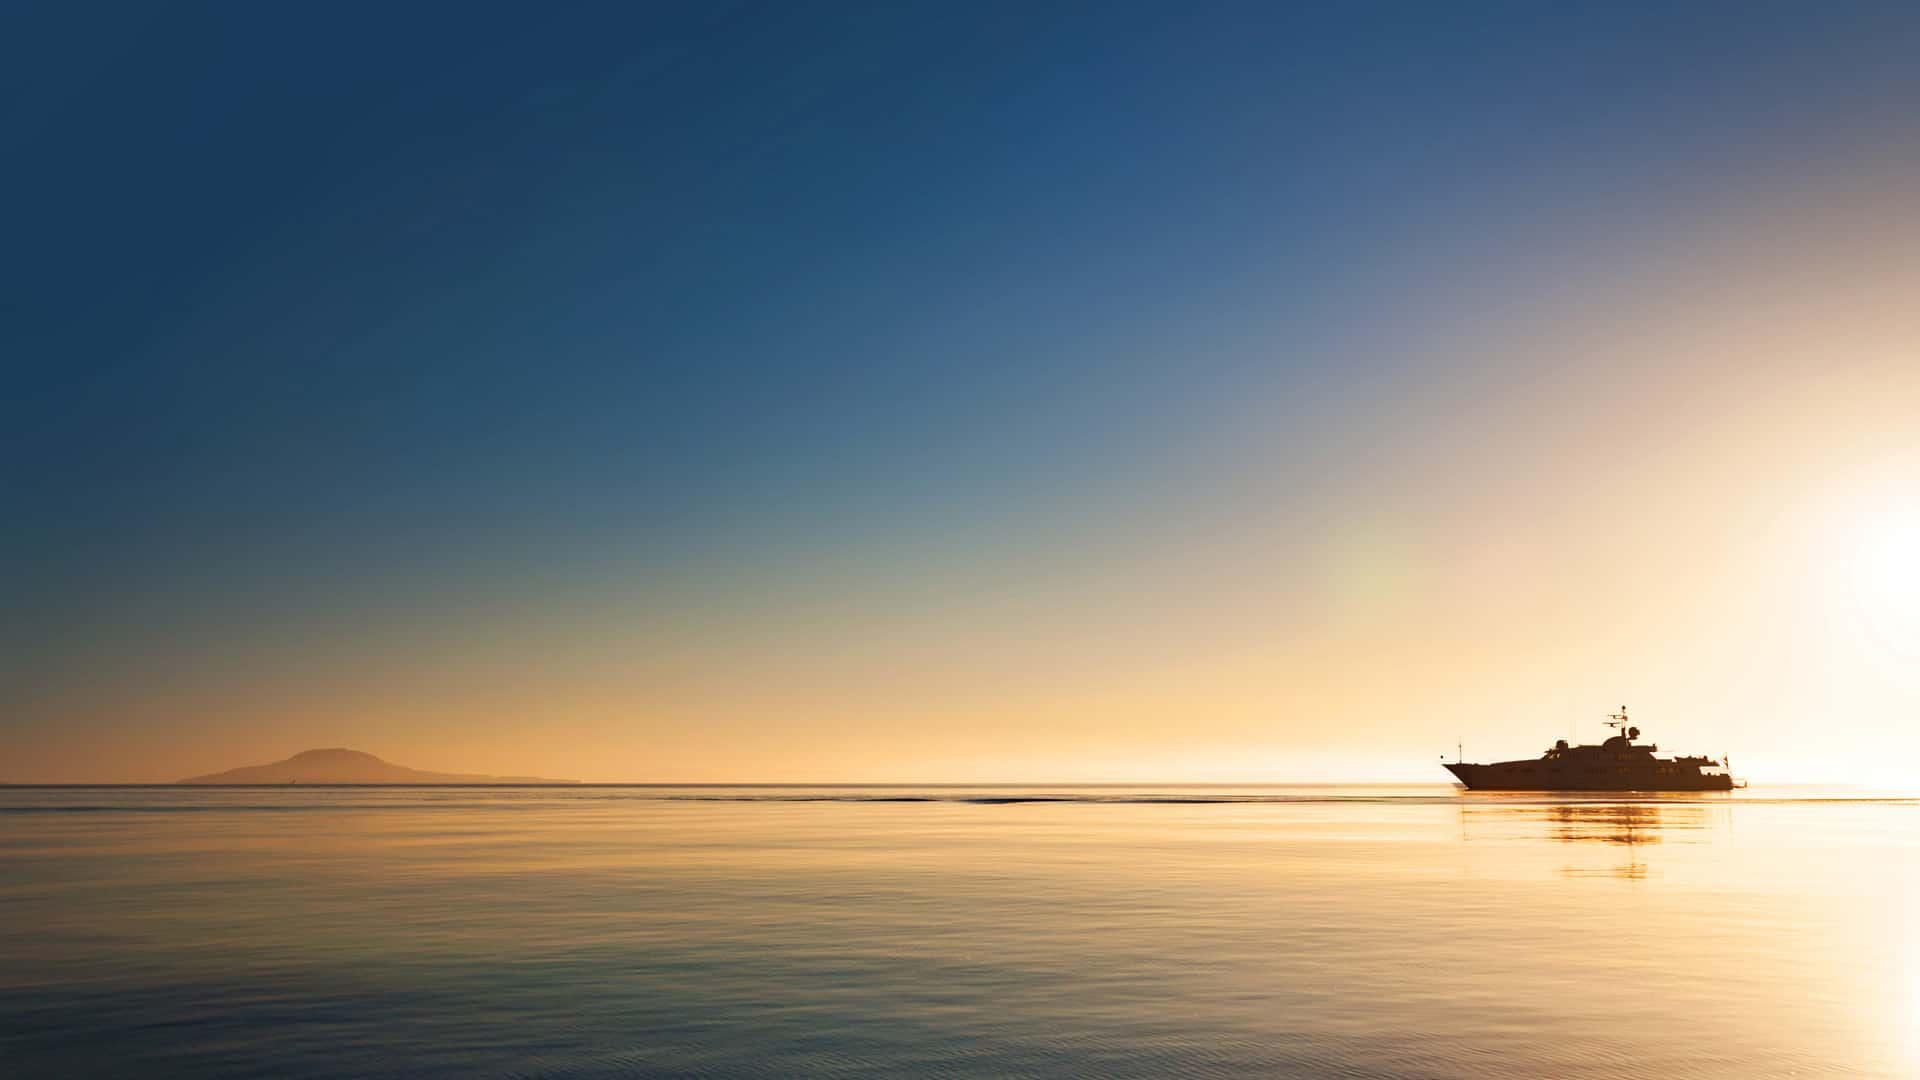 Superyacht cruising on a calm ocean at sunset